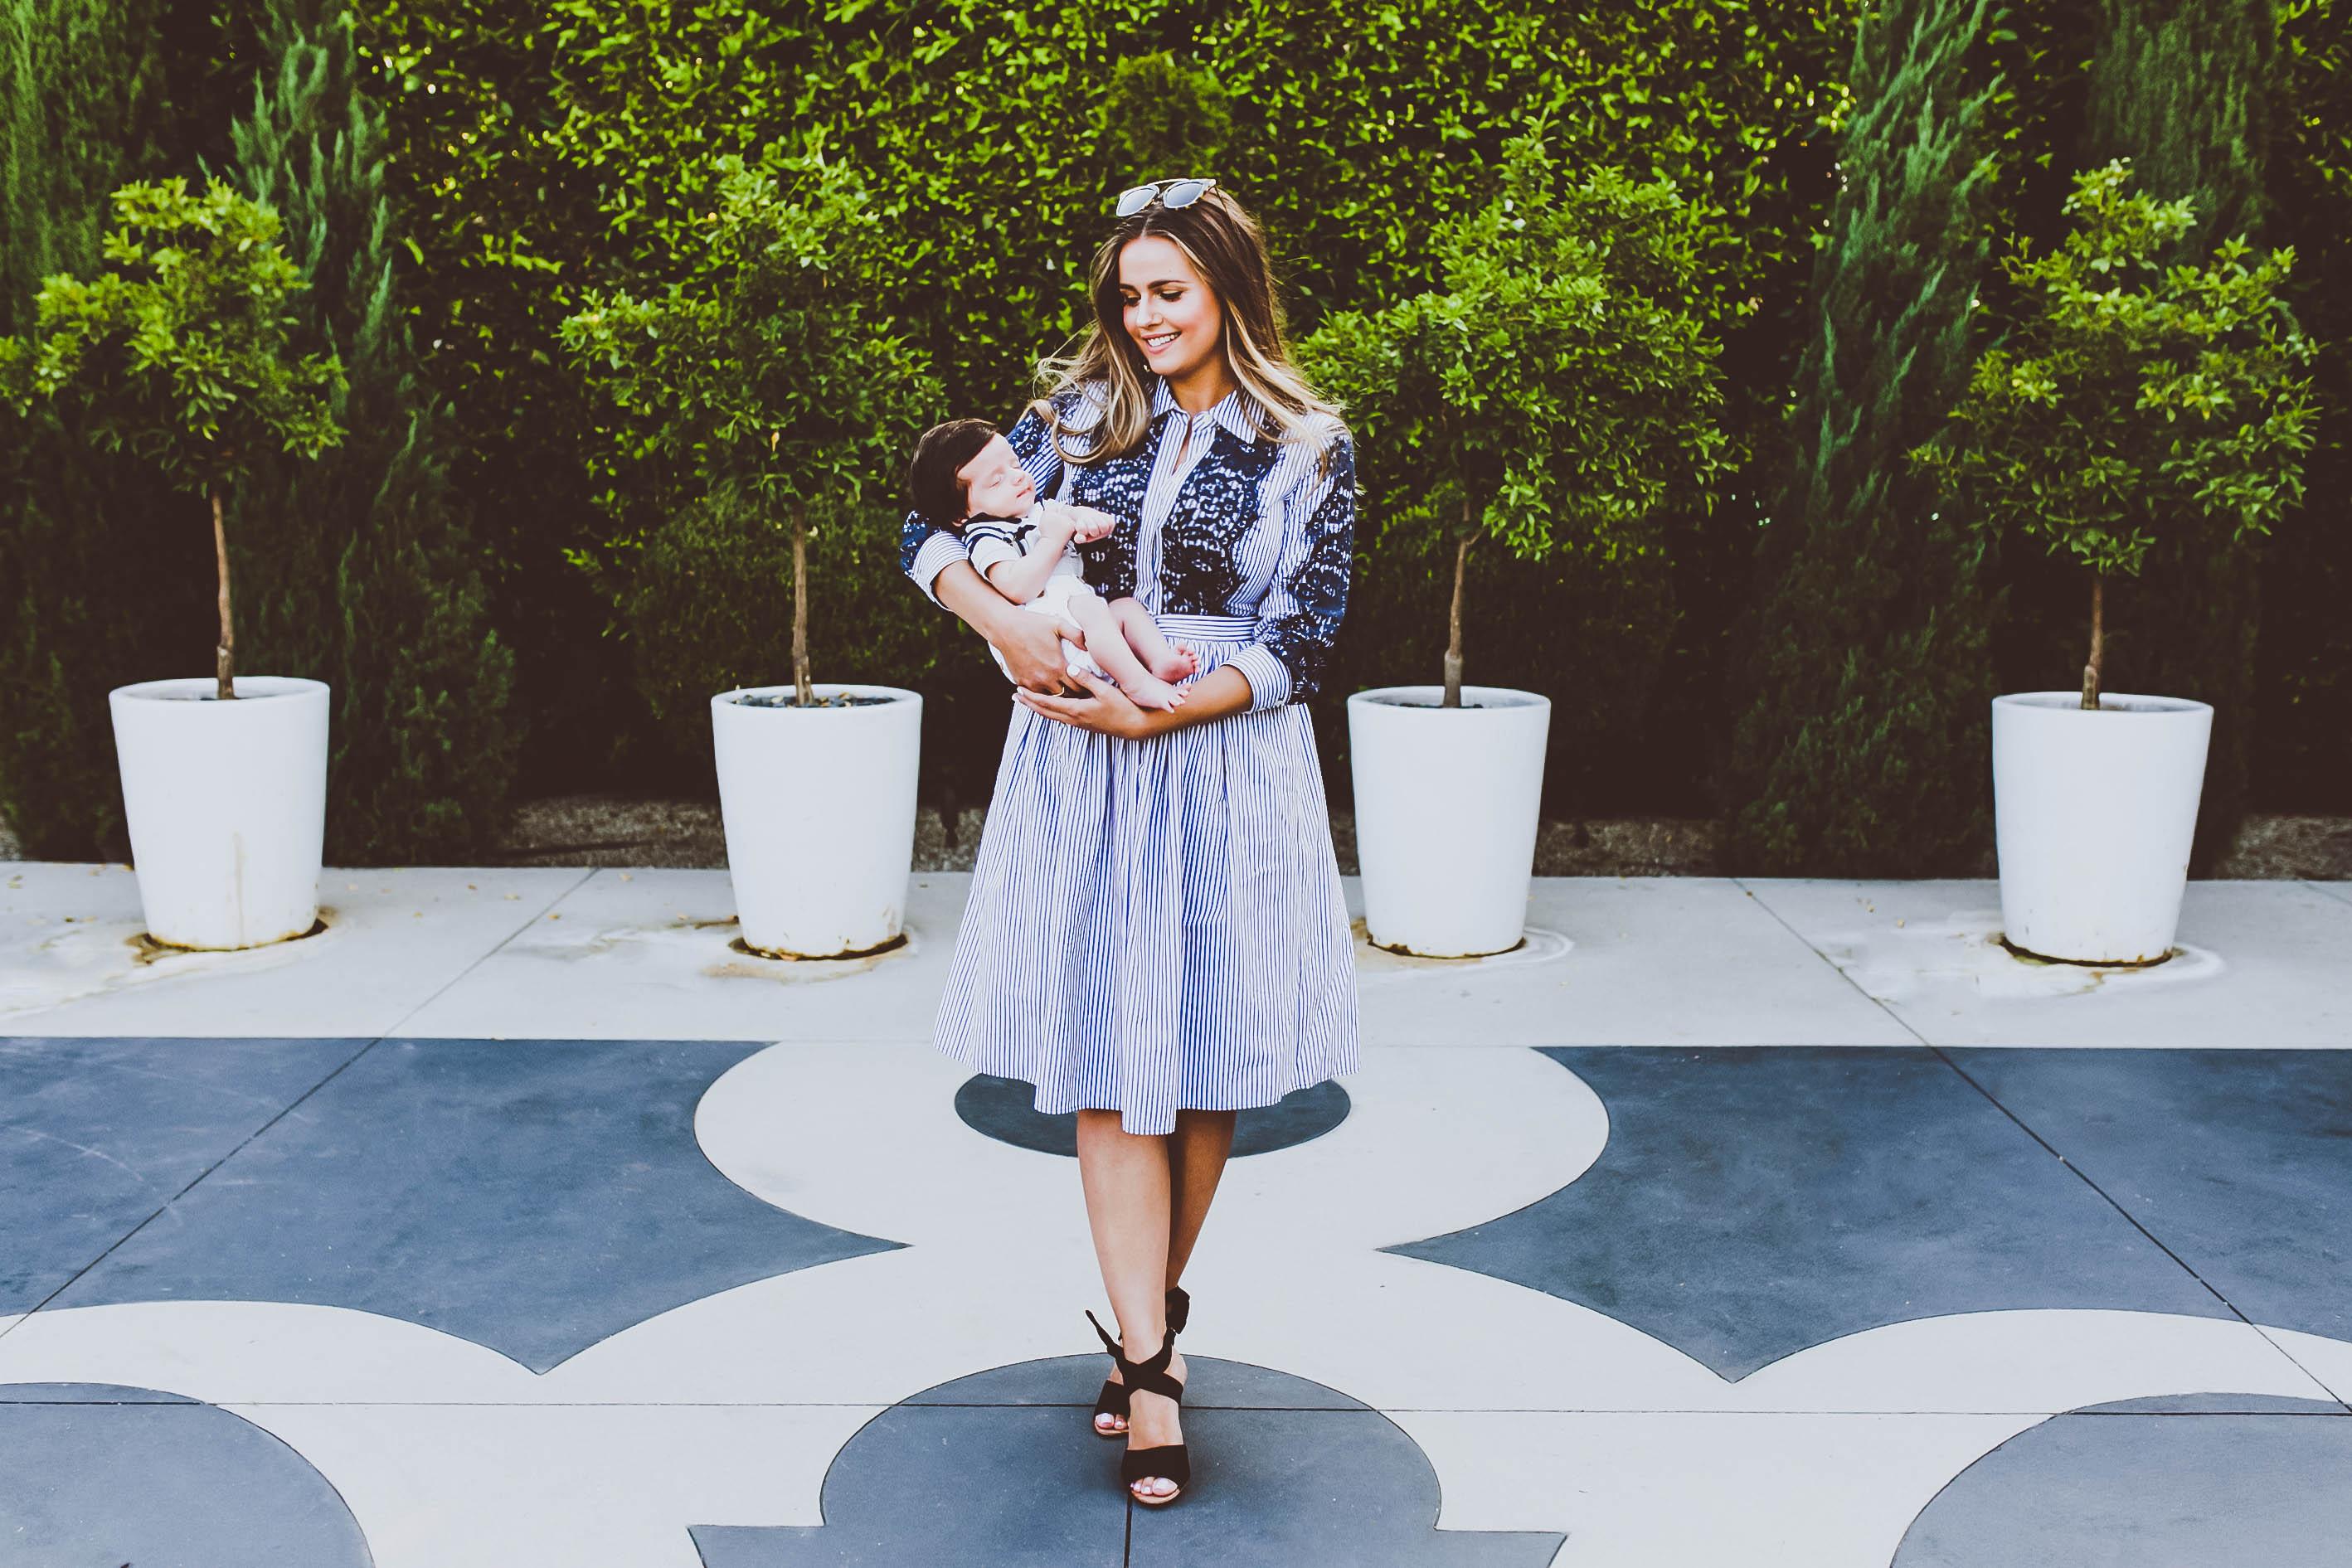 #OOTD // Striped Lace Button Down Dress & Black Suede Wrap Heels | BondGirlGlam.com